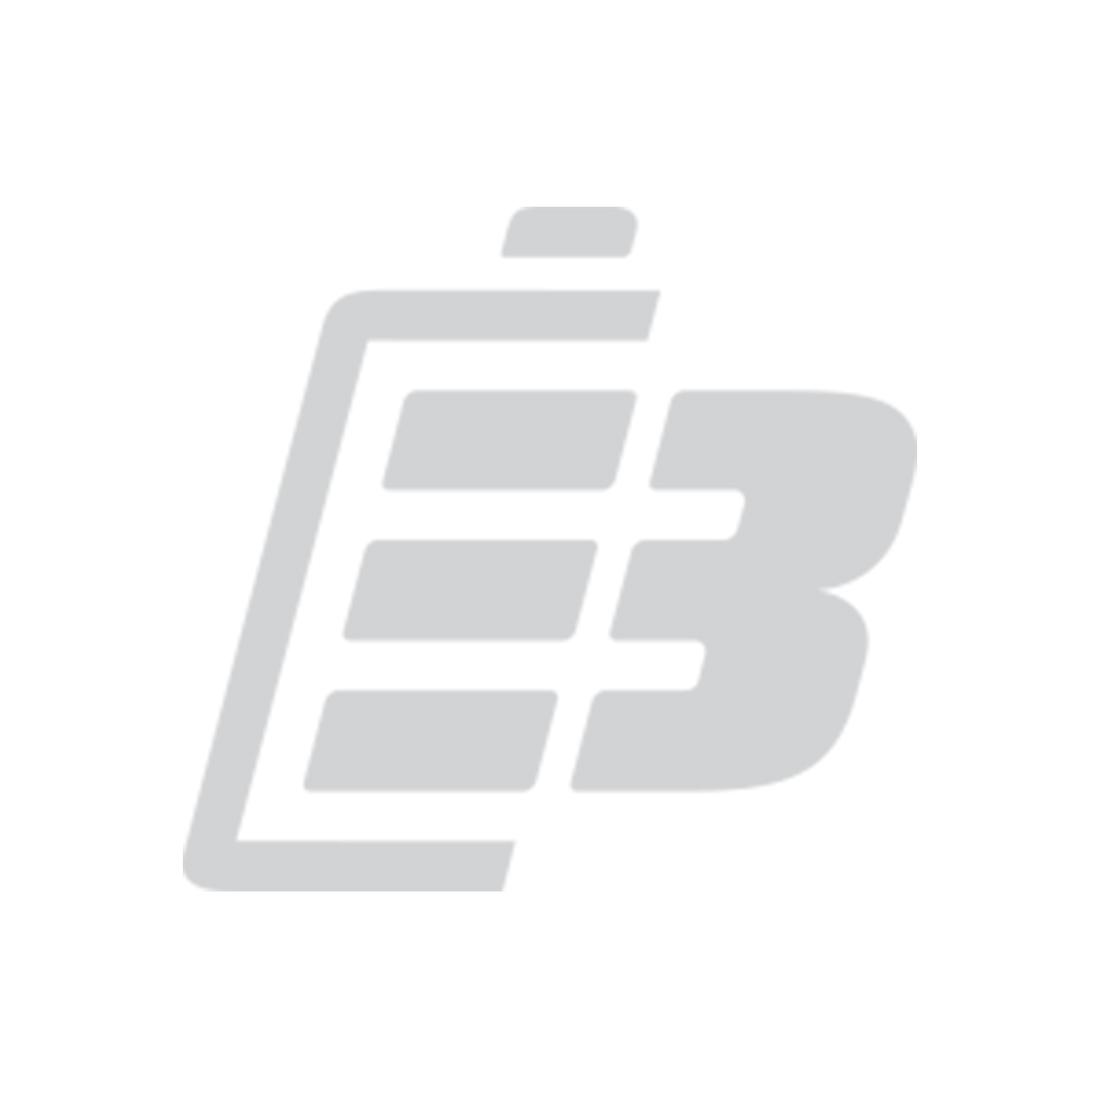 PDA battery HP iPAQ 900_1